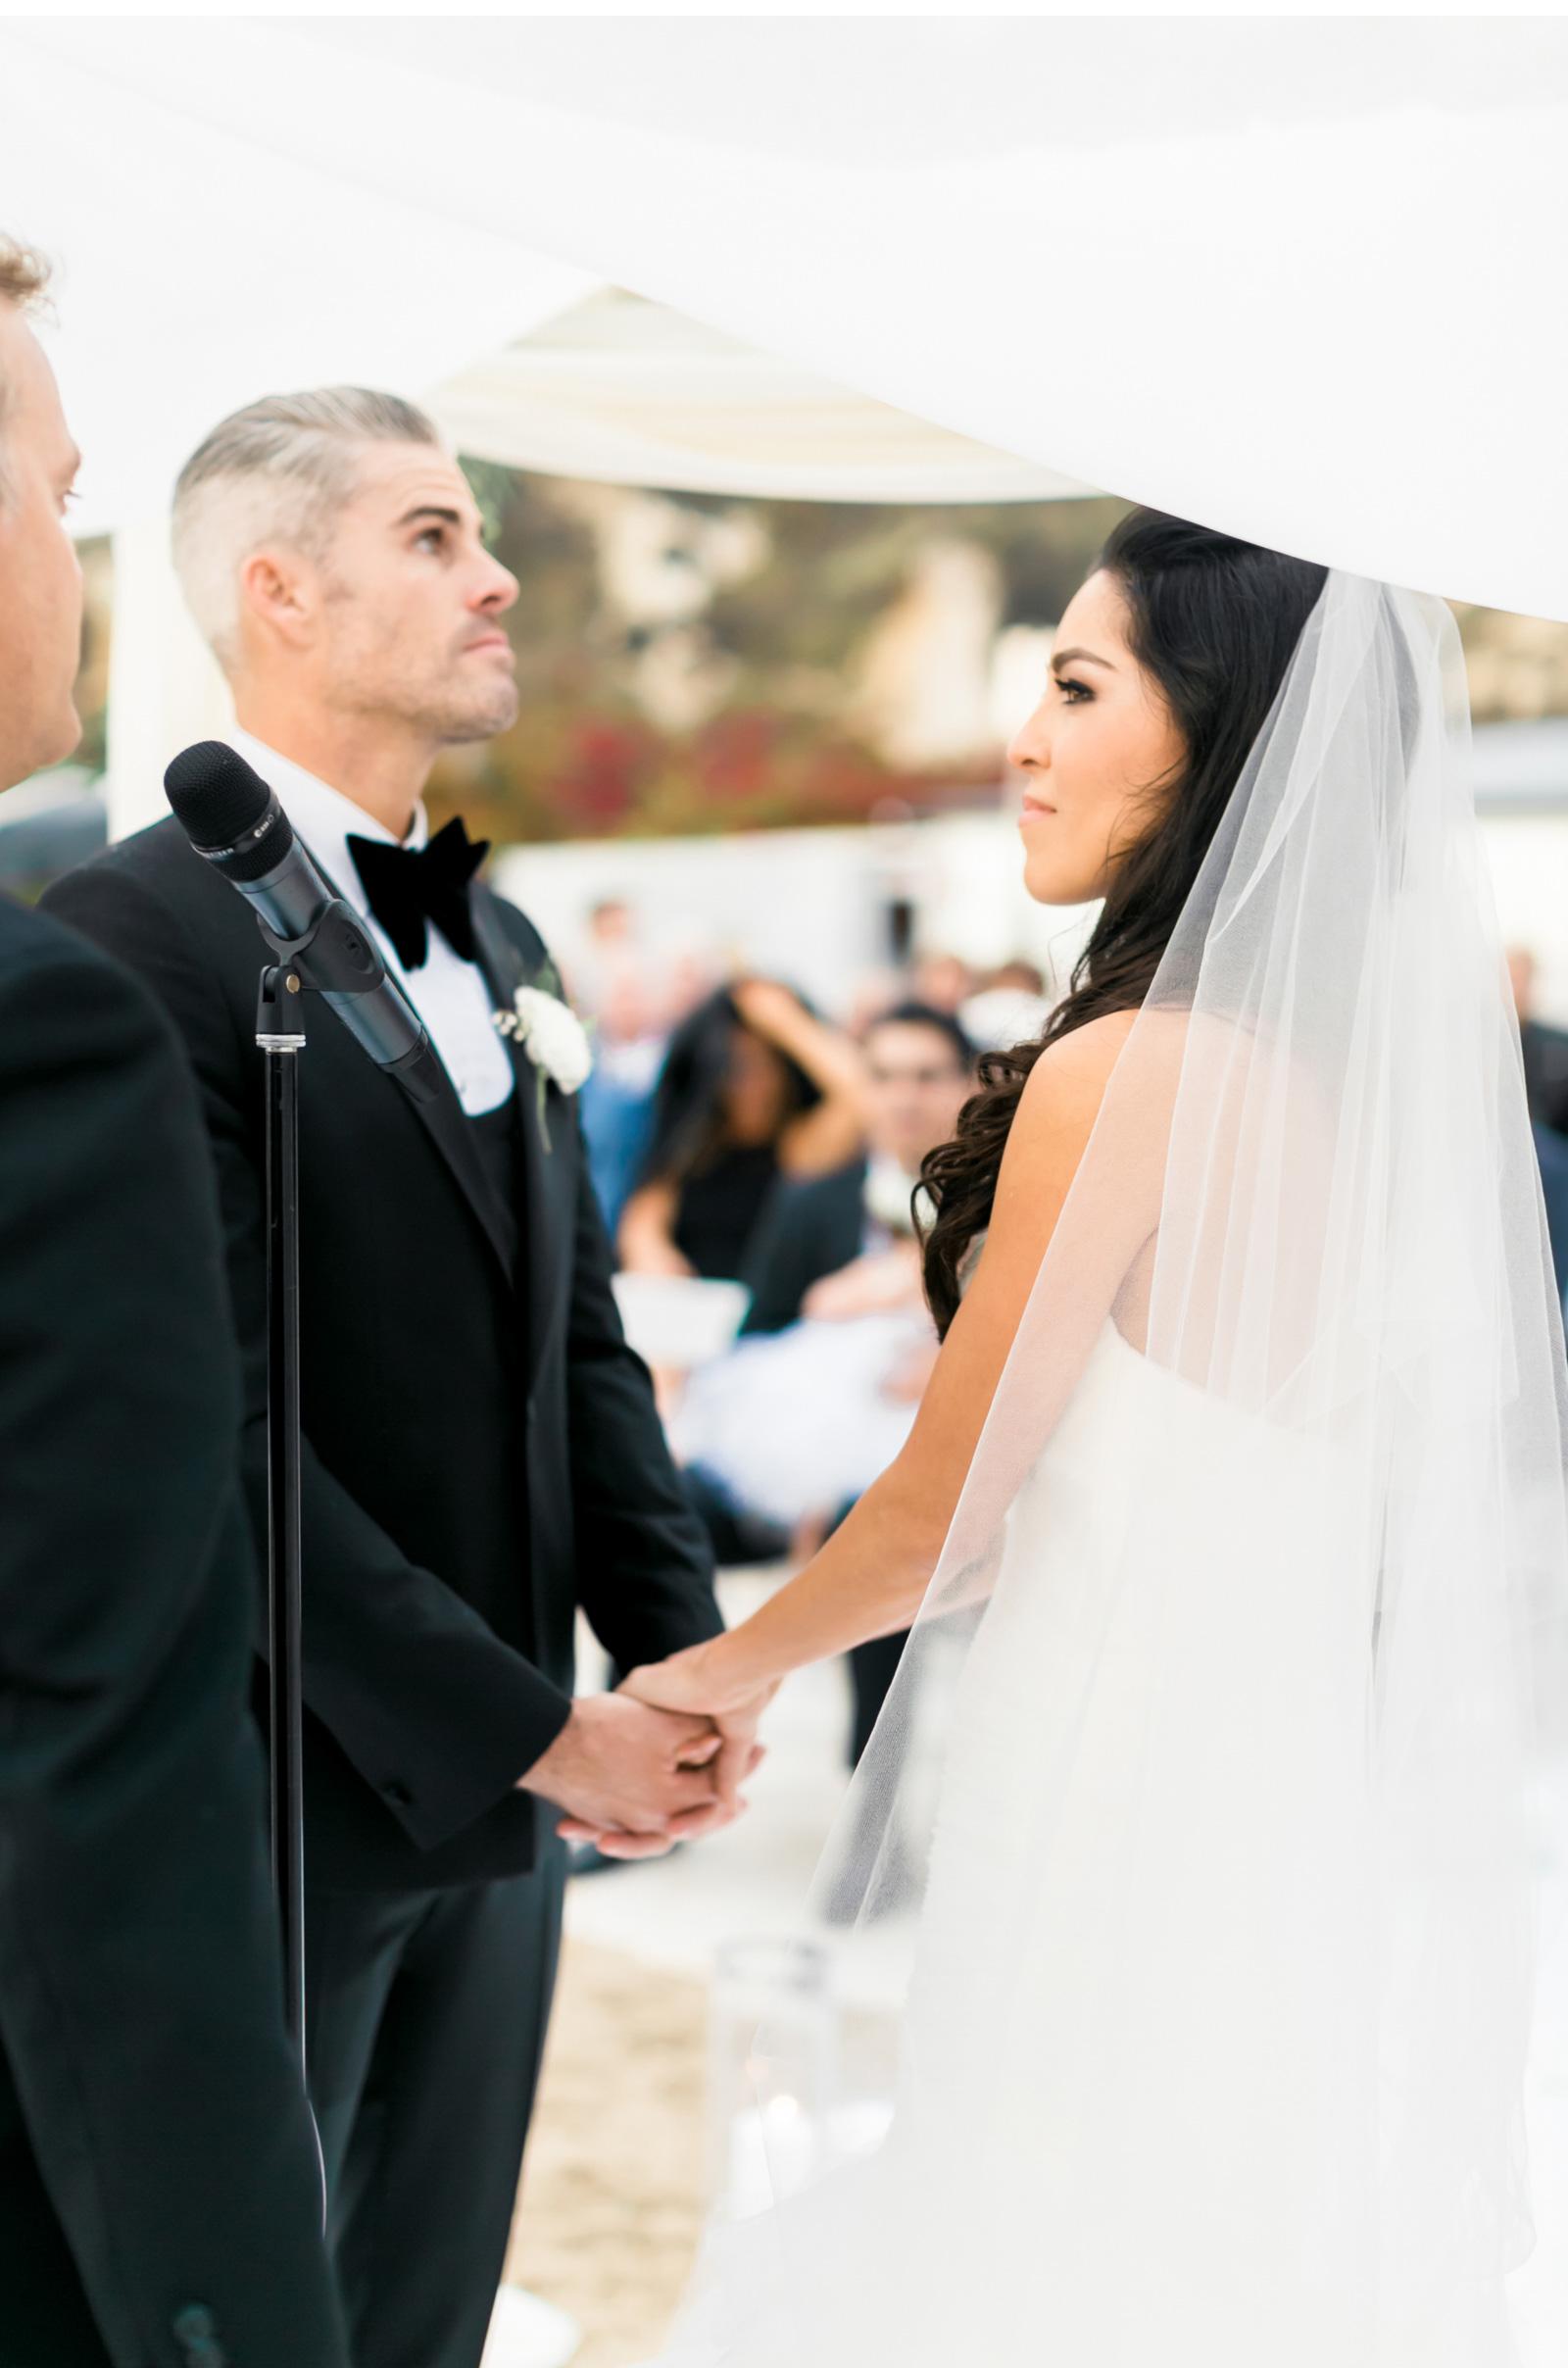 Malibu-Wedding-Natalie-Schutt-Photography-Style-Me-Pretty_16.jpg